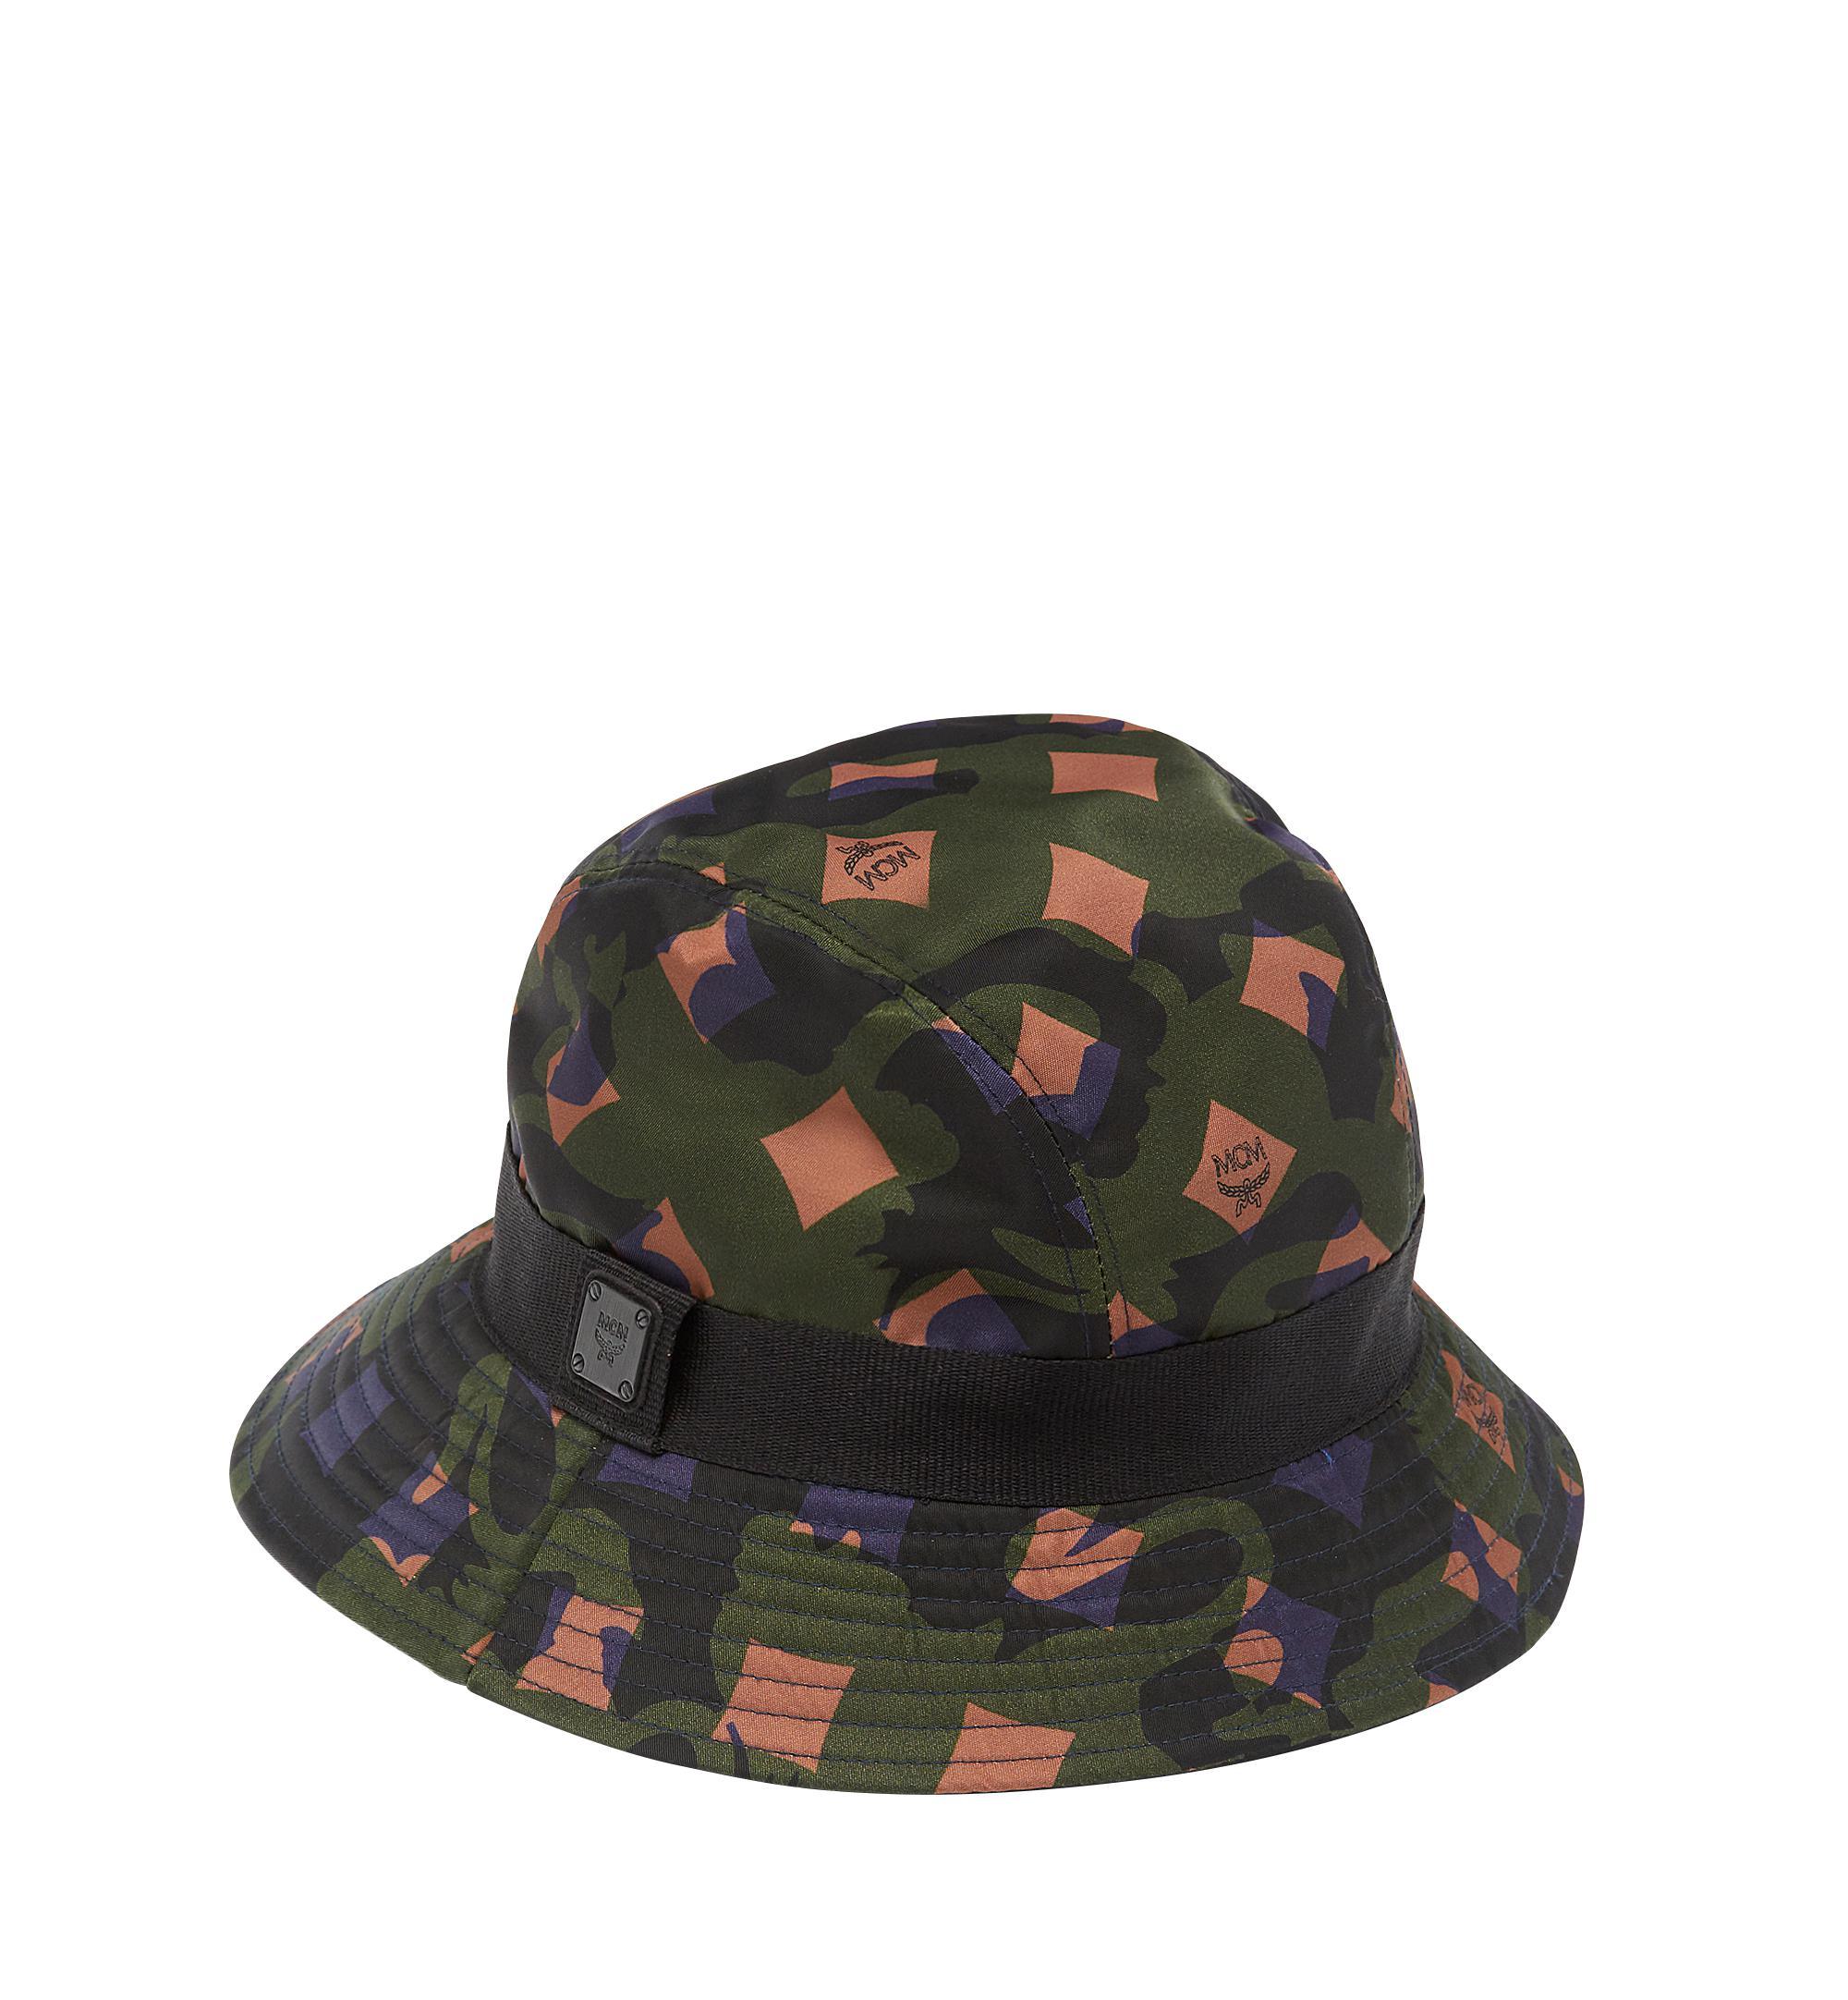 Lyst - MCM Bucket Hat In Camo Nylon in Green c4f5a6104b0d